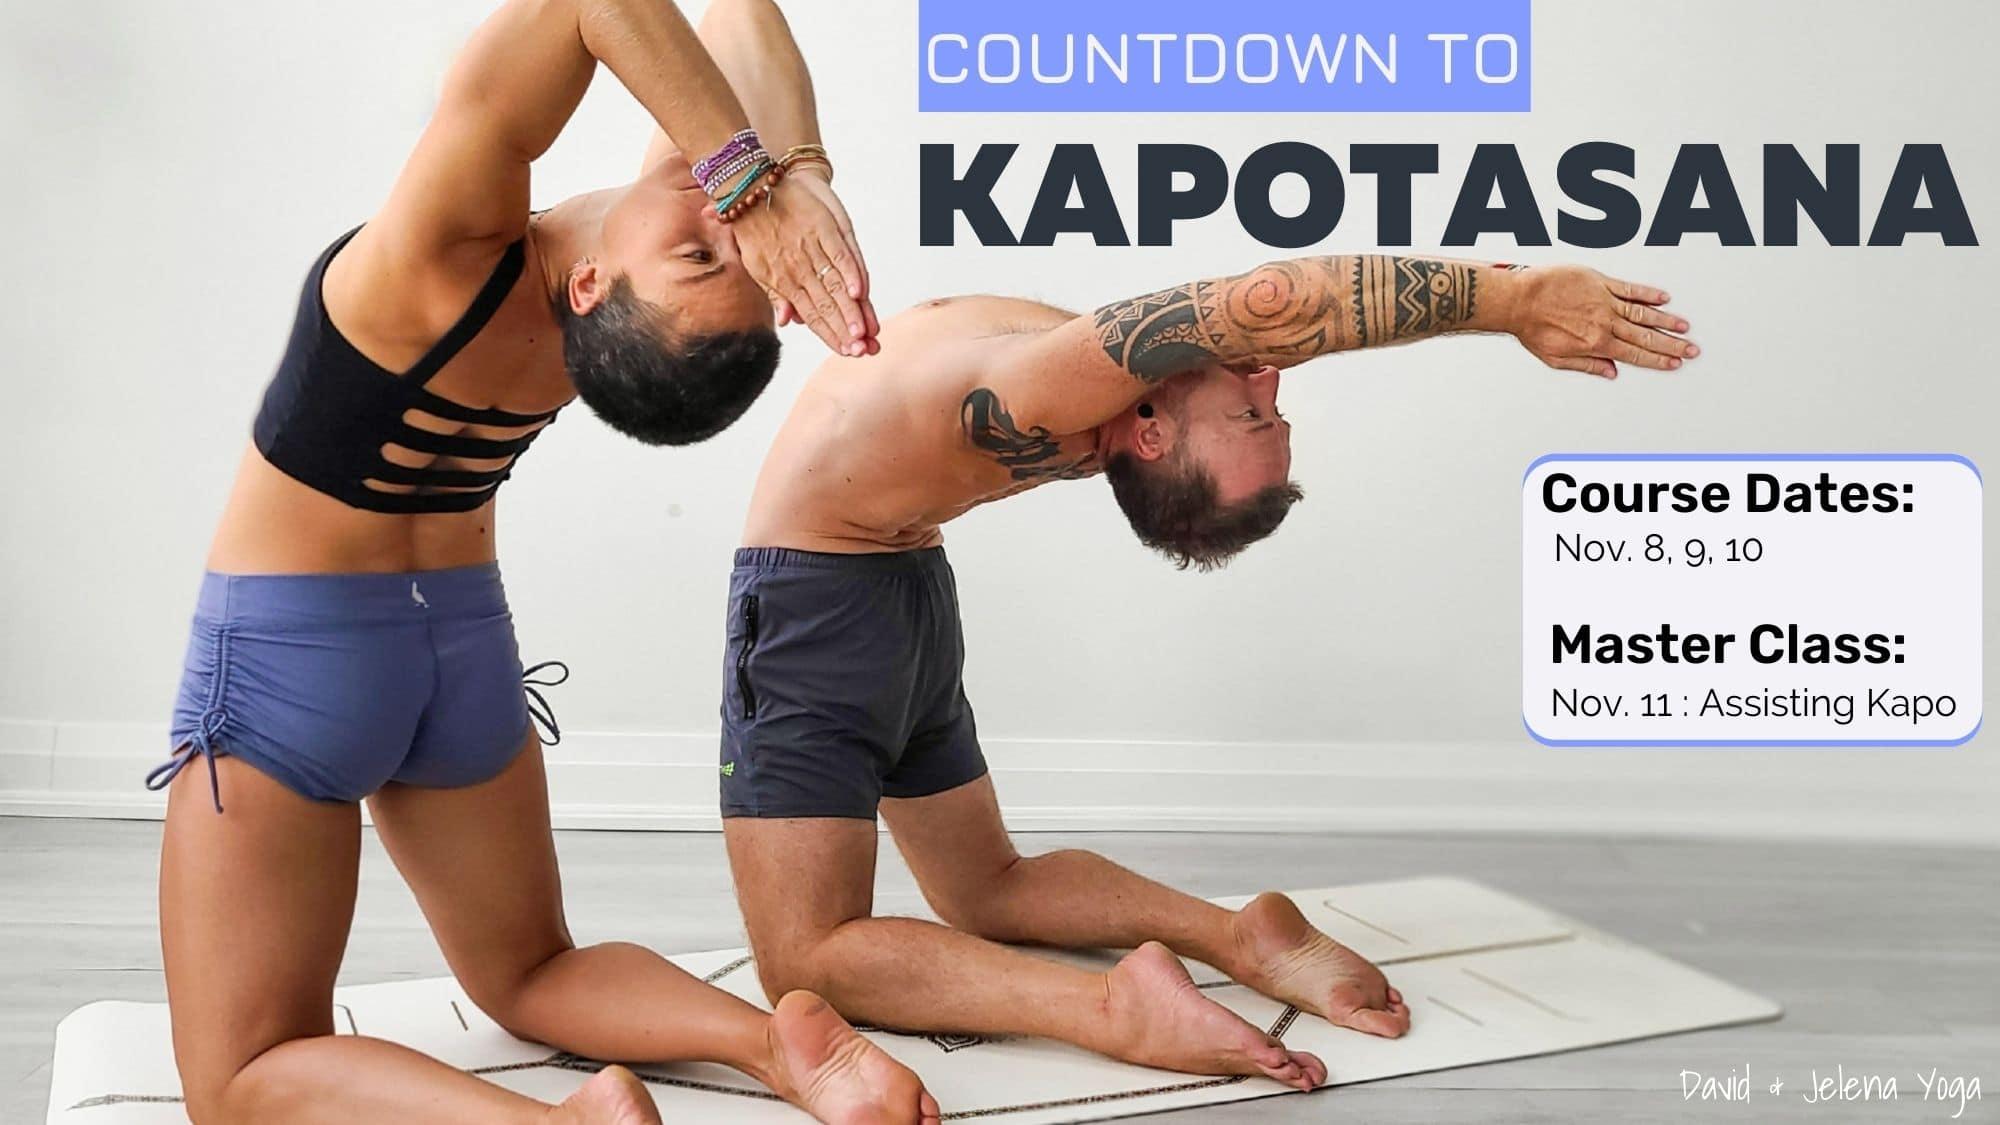 Countdown to Kapotasana - Web